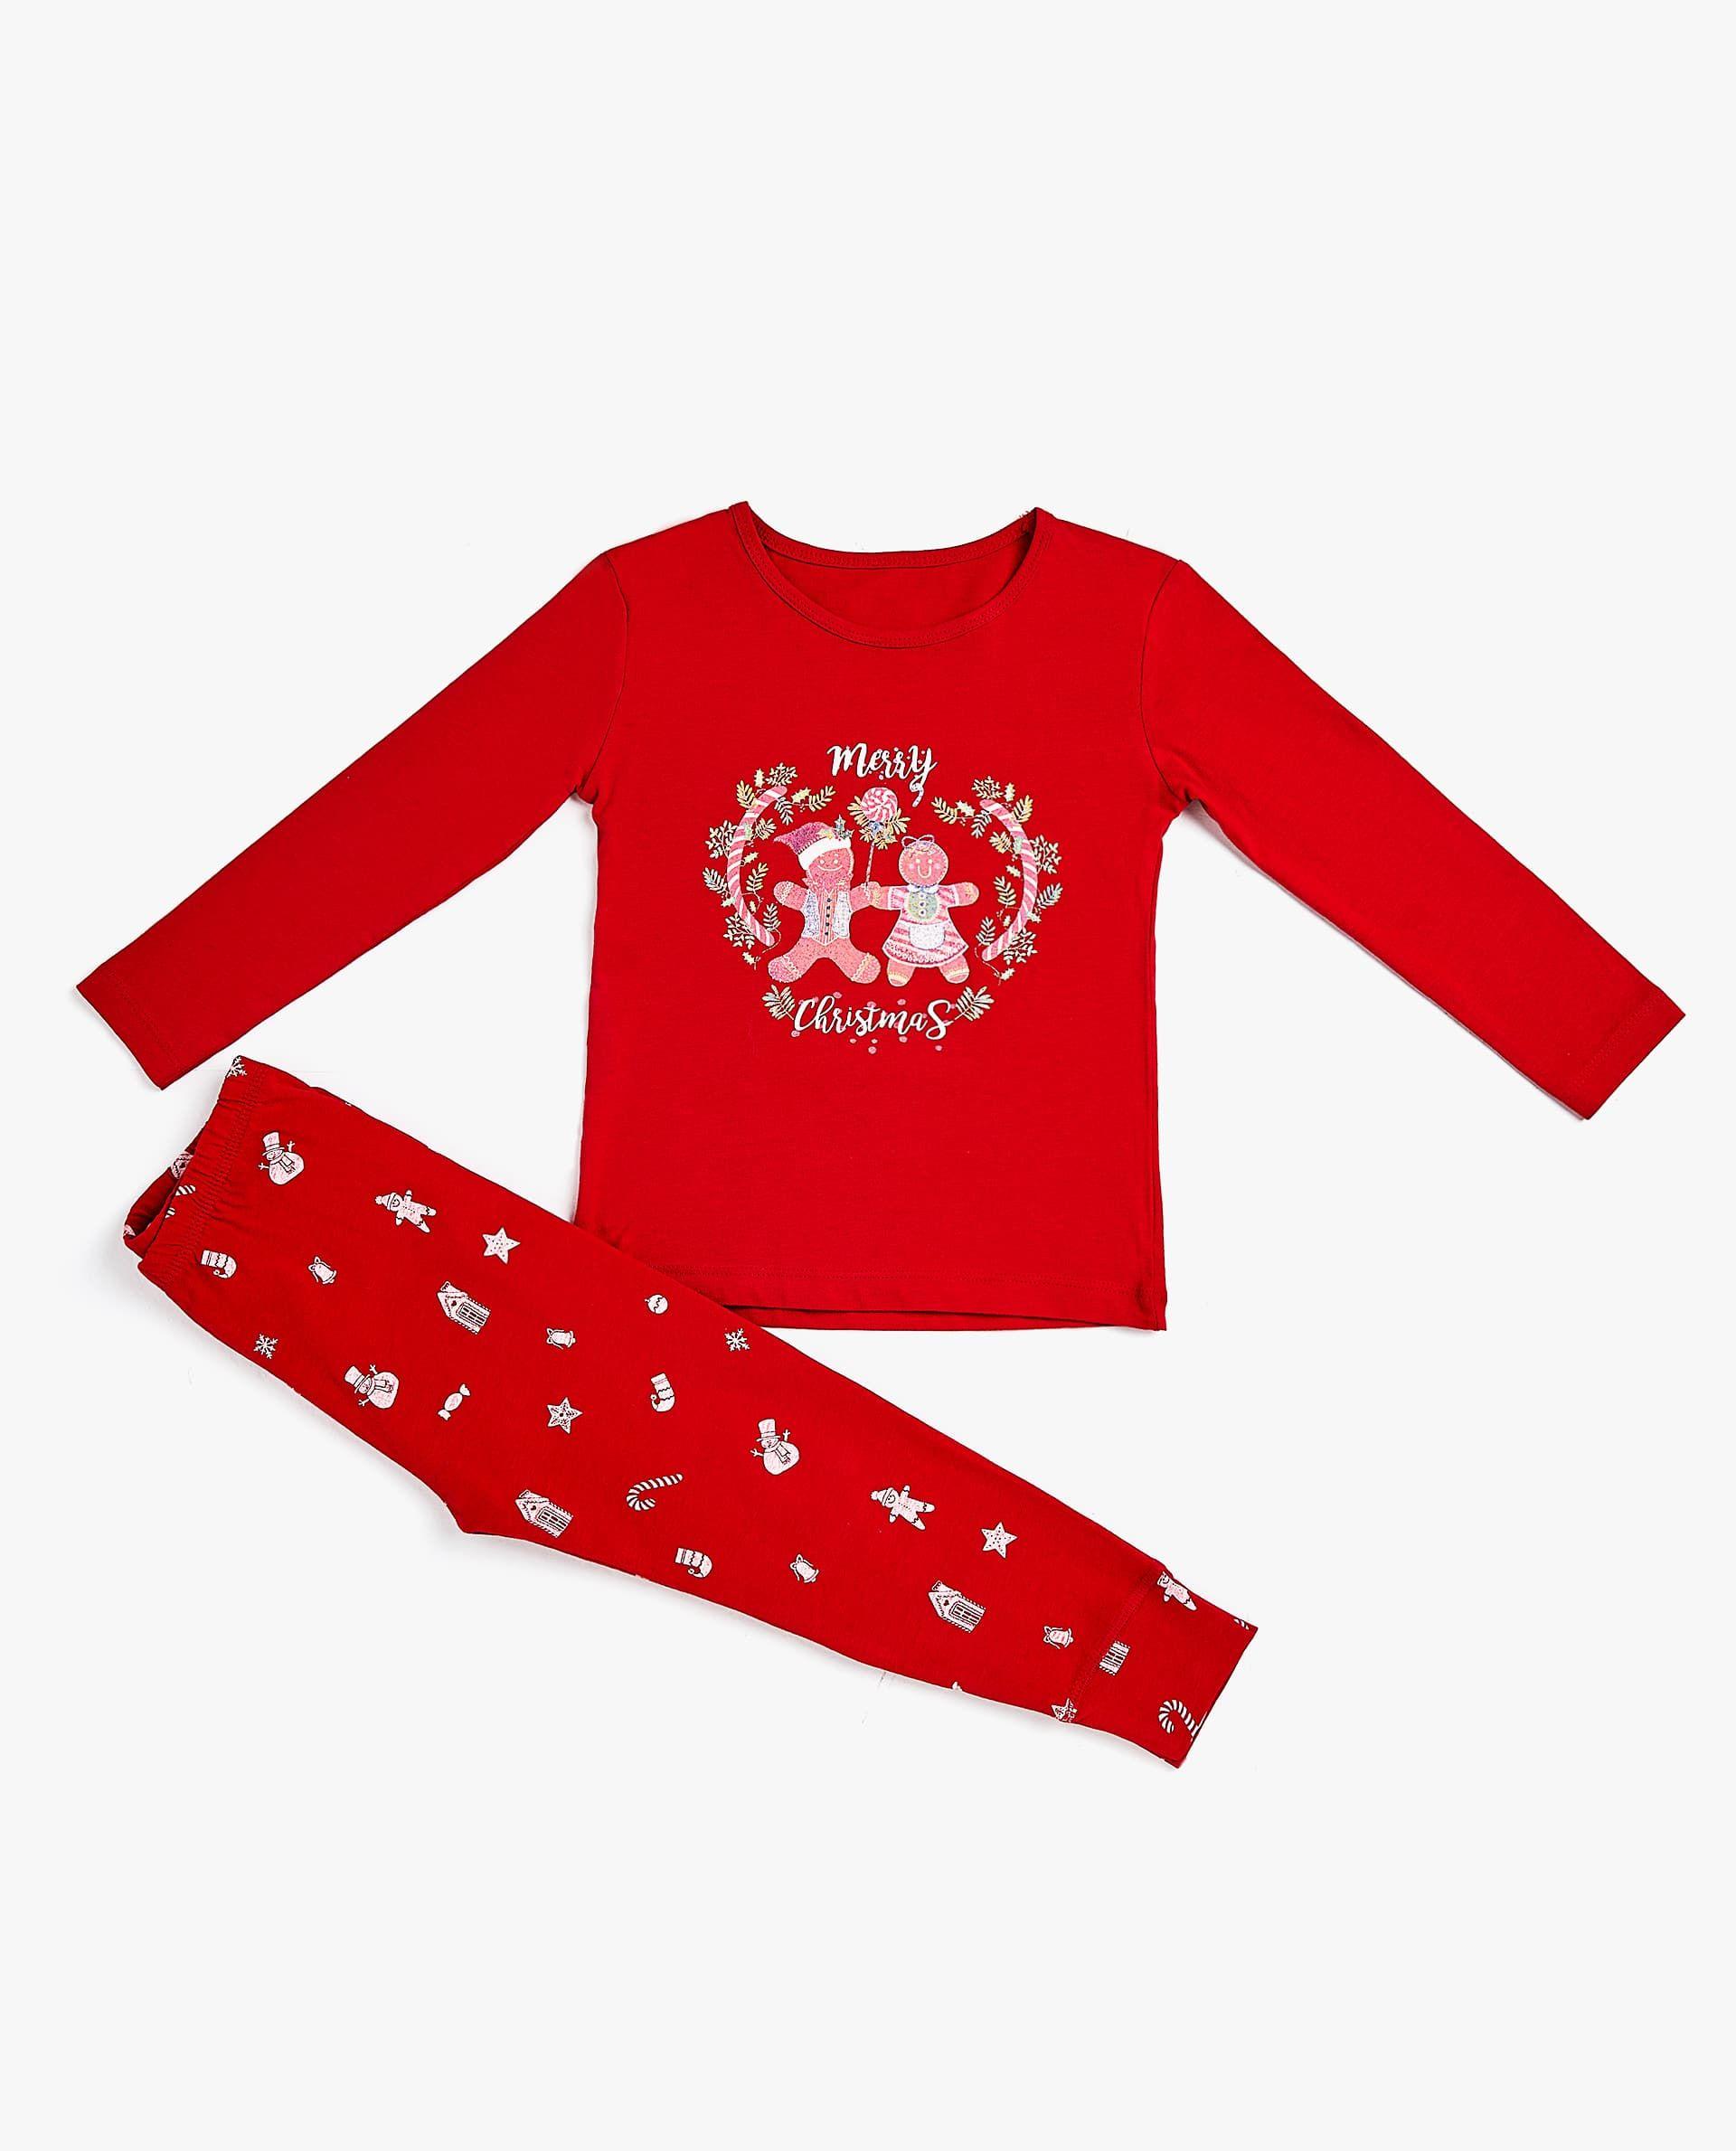 Pijama Galletas Gingerbread Niños Navidad Zara Home España Zara Home Zara Pijama